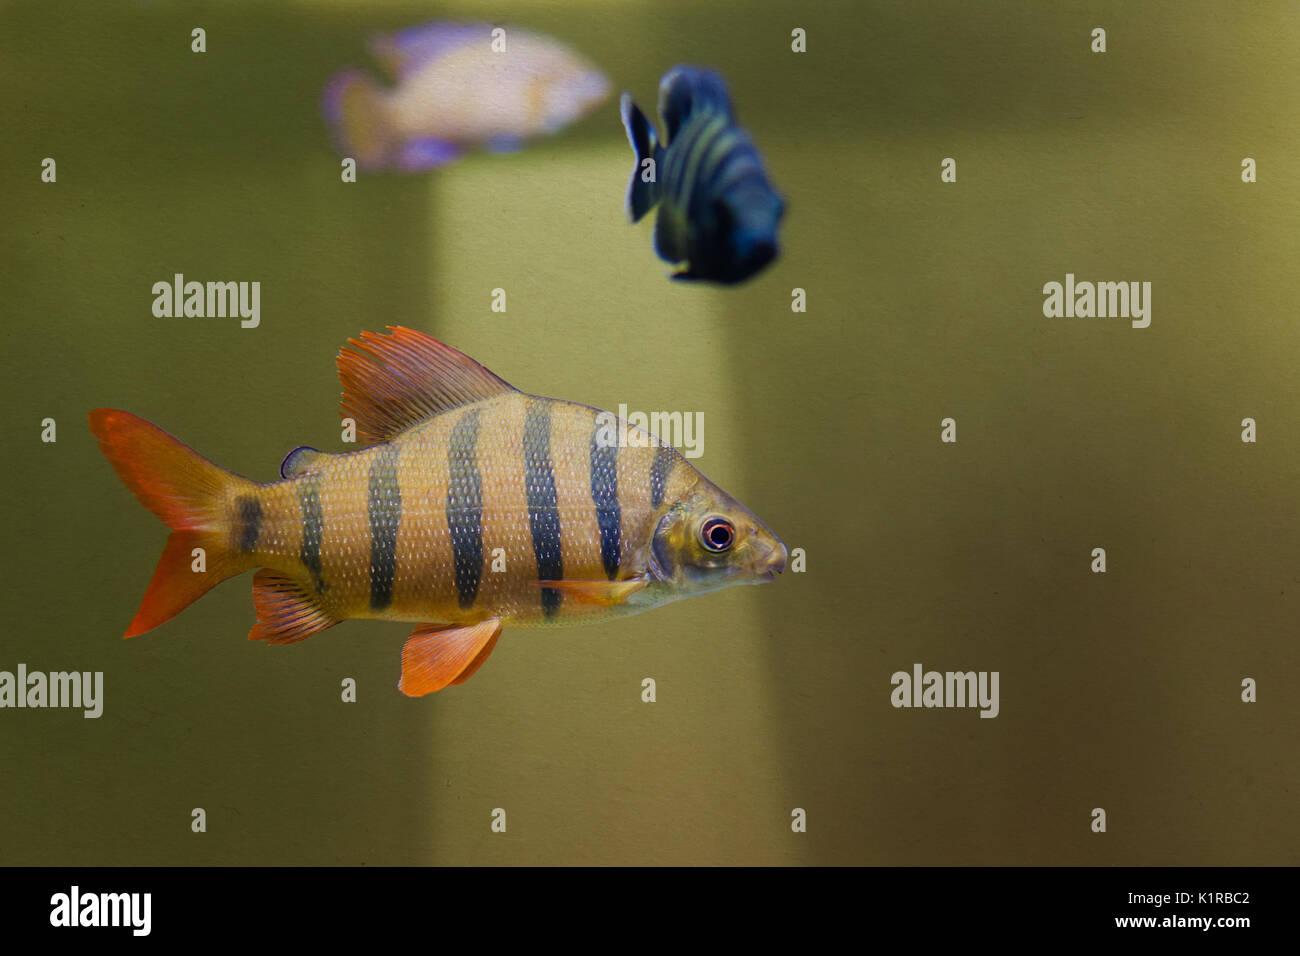 Distichodus lusosso fish. Longsnout distichodus. Freshwater tropical creature, striped yellow fish with orange fins. toned textured vintage paper, soft focus - Stock Image